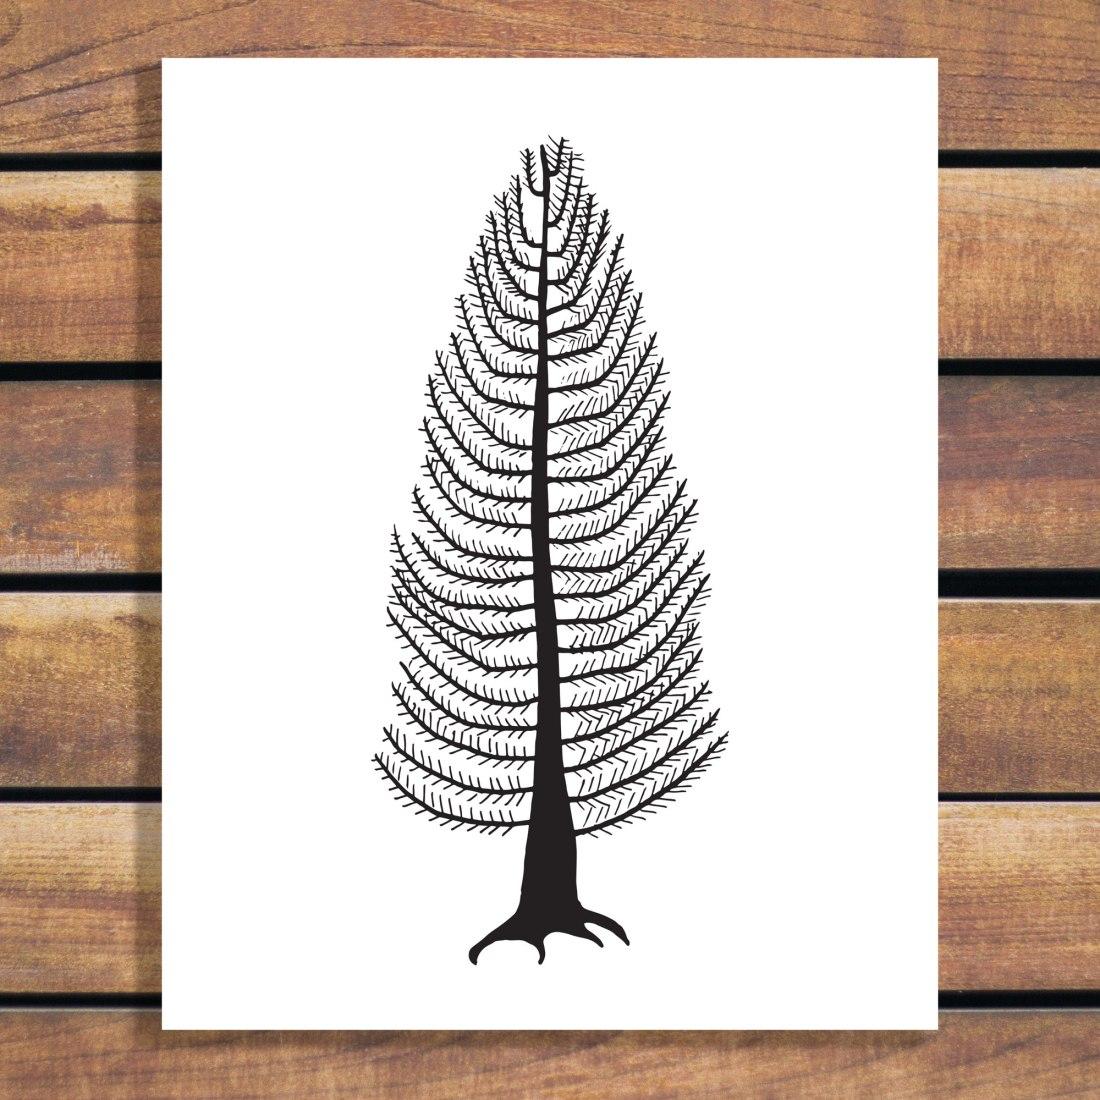 Modern Cedar Tree Illustration Art Print by Brina Schenk